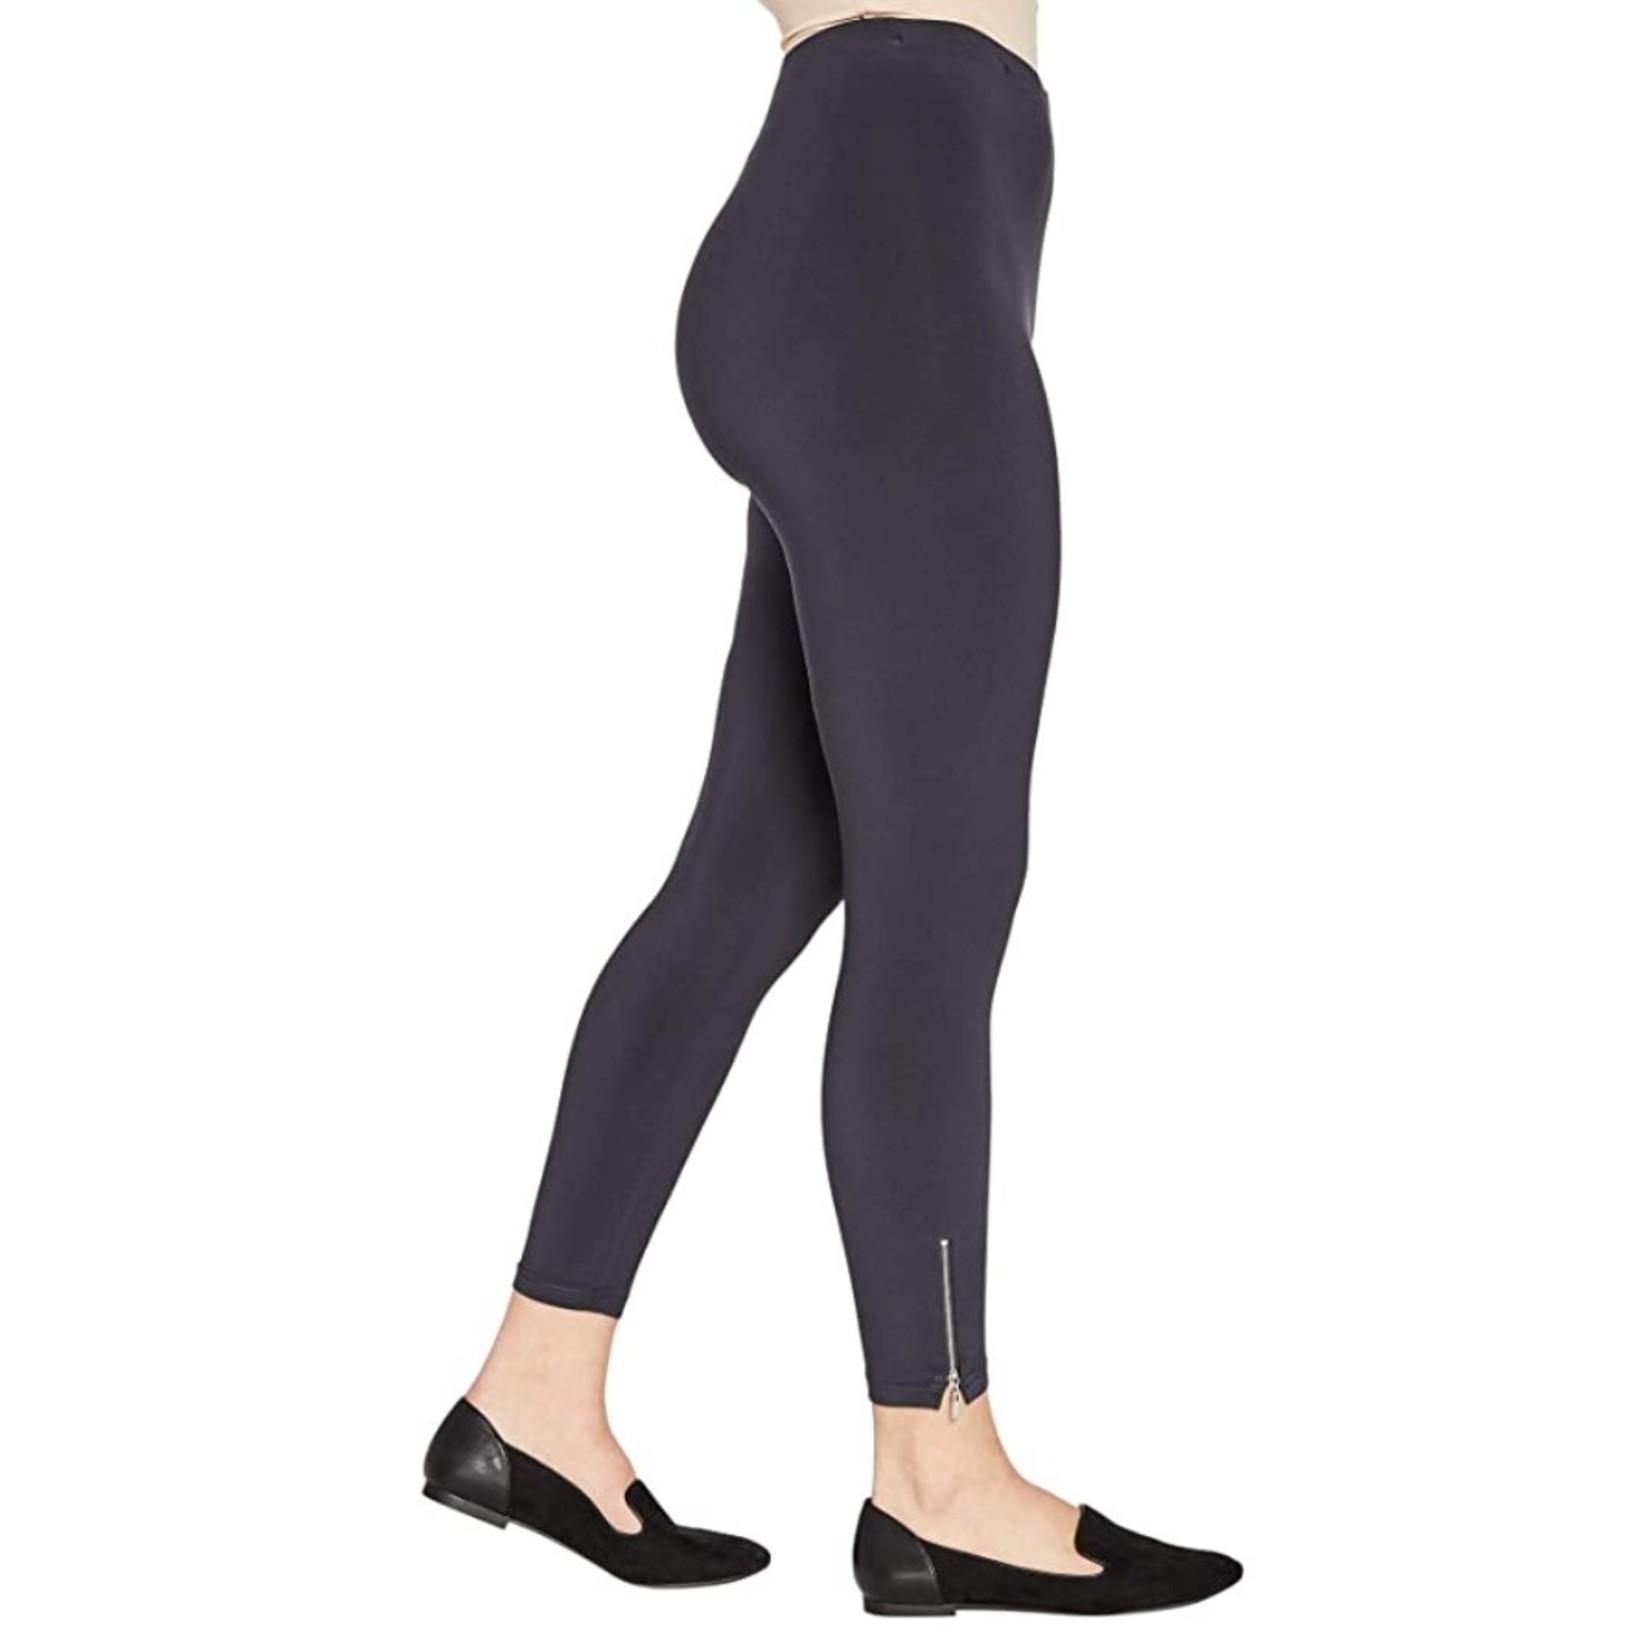 Sympli Sympli Zest Legging